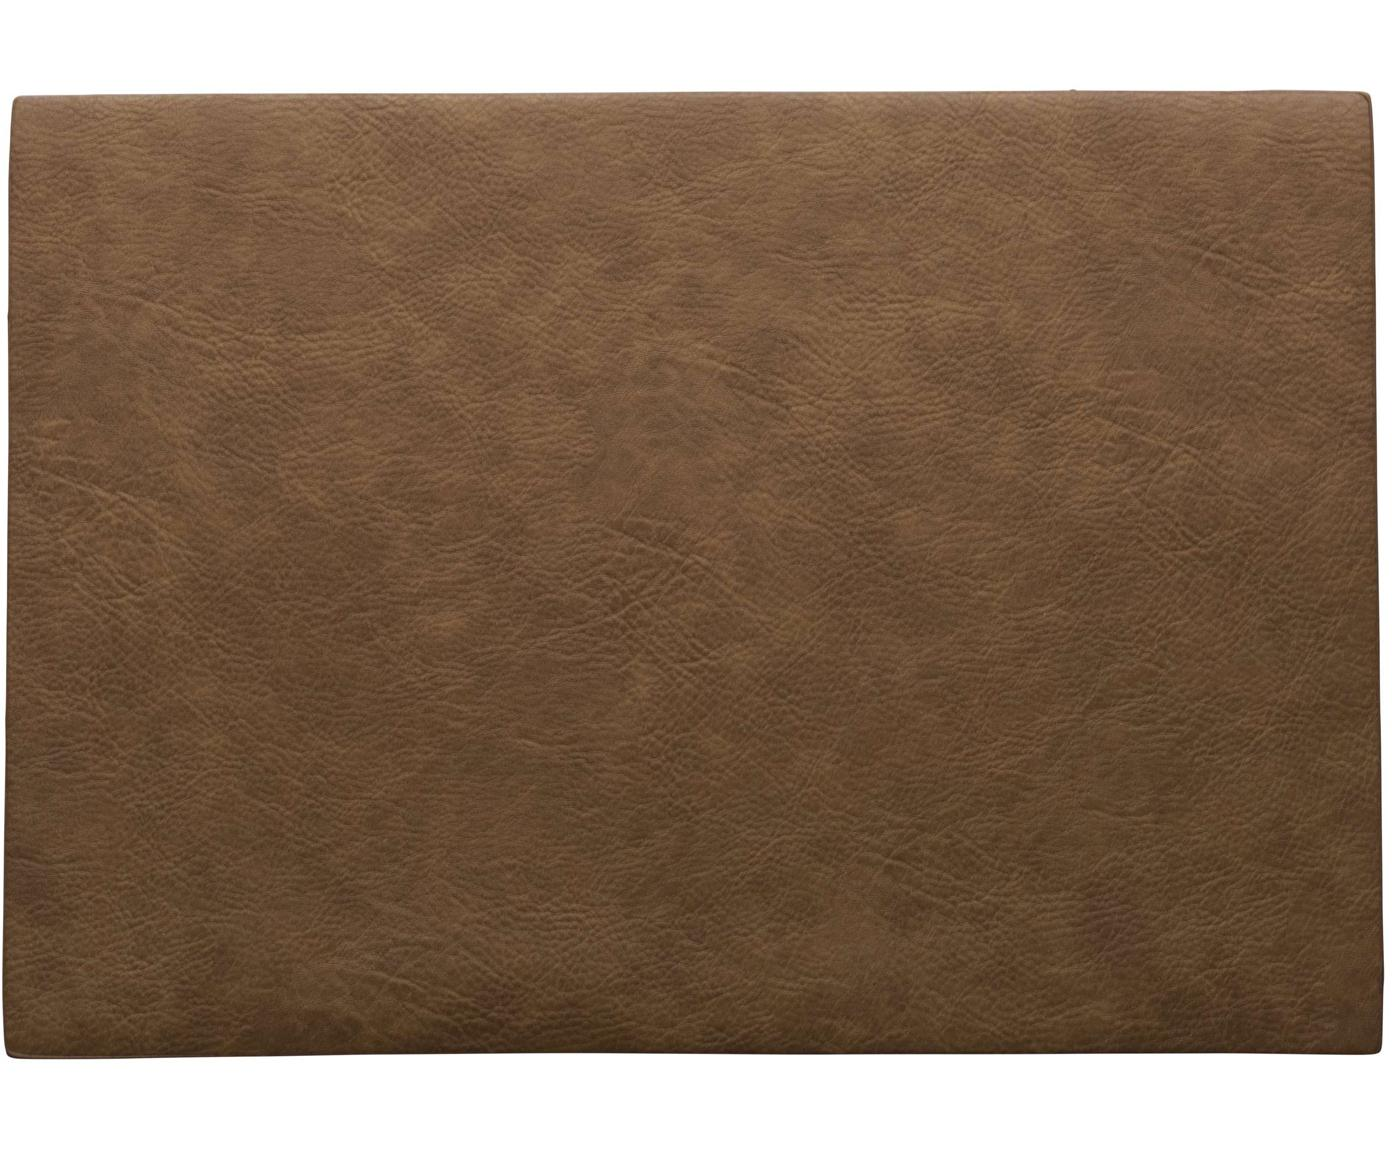 Podkładka ze sztucznej skóry Plini, 2 szt., Sztuczna skóra (poliuretan), Brązowy, S 33 x D 46 cm